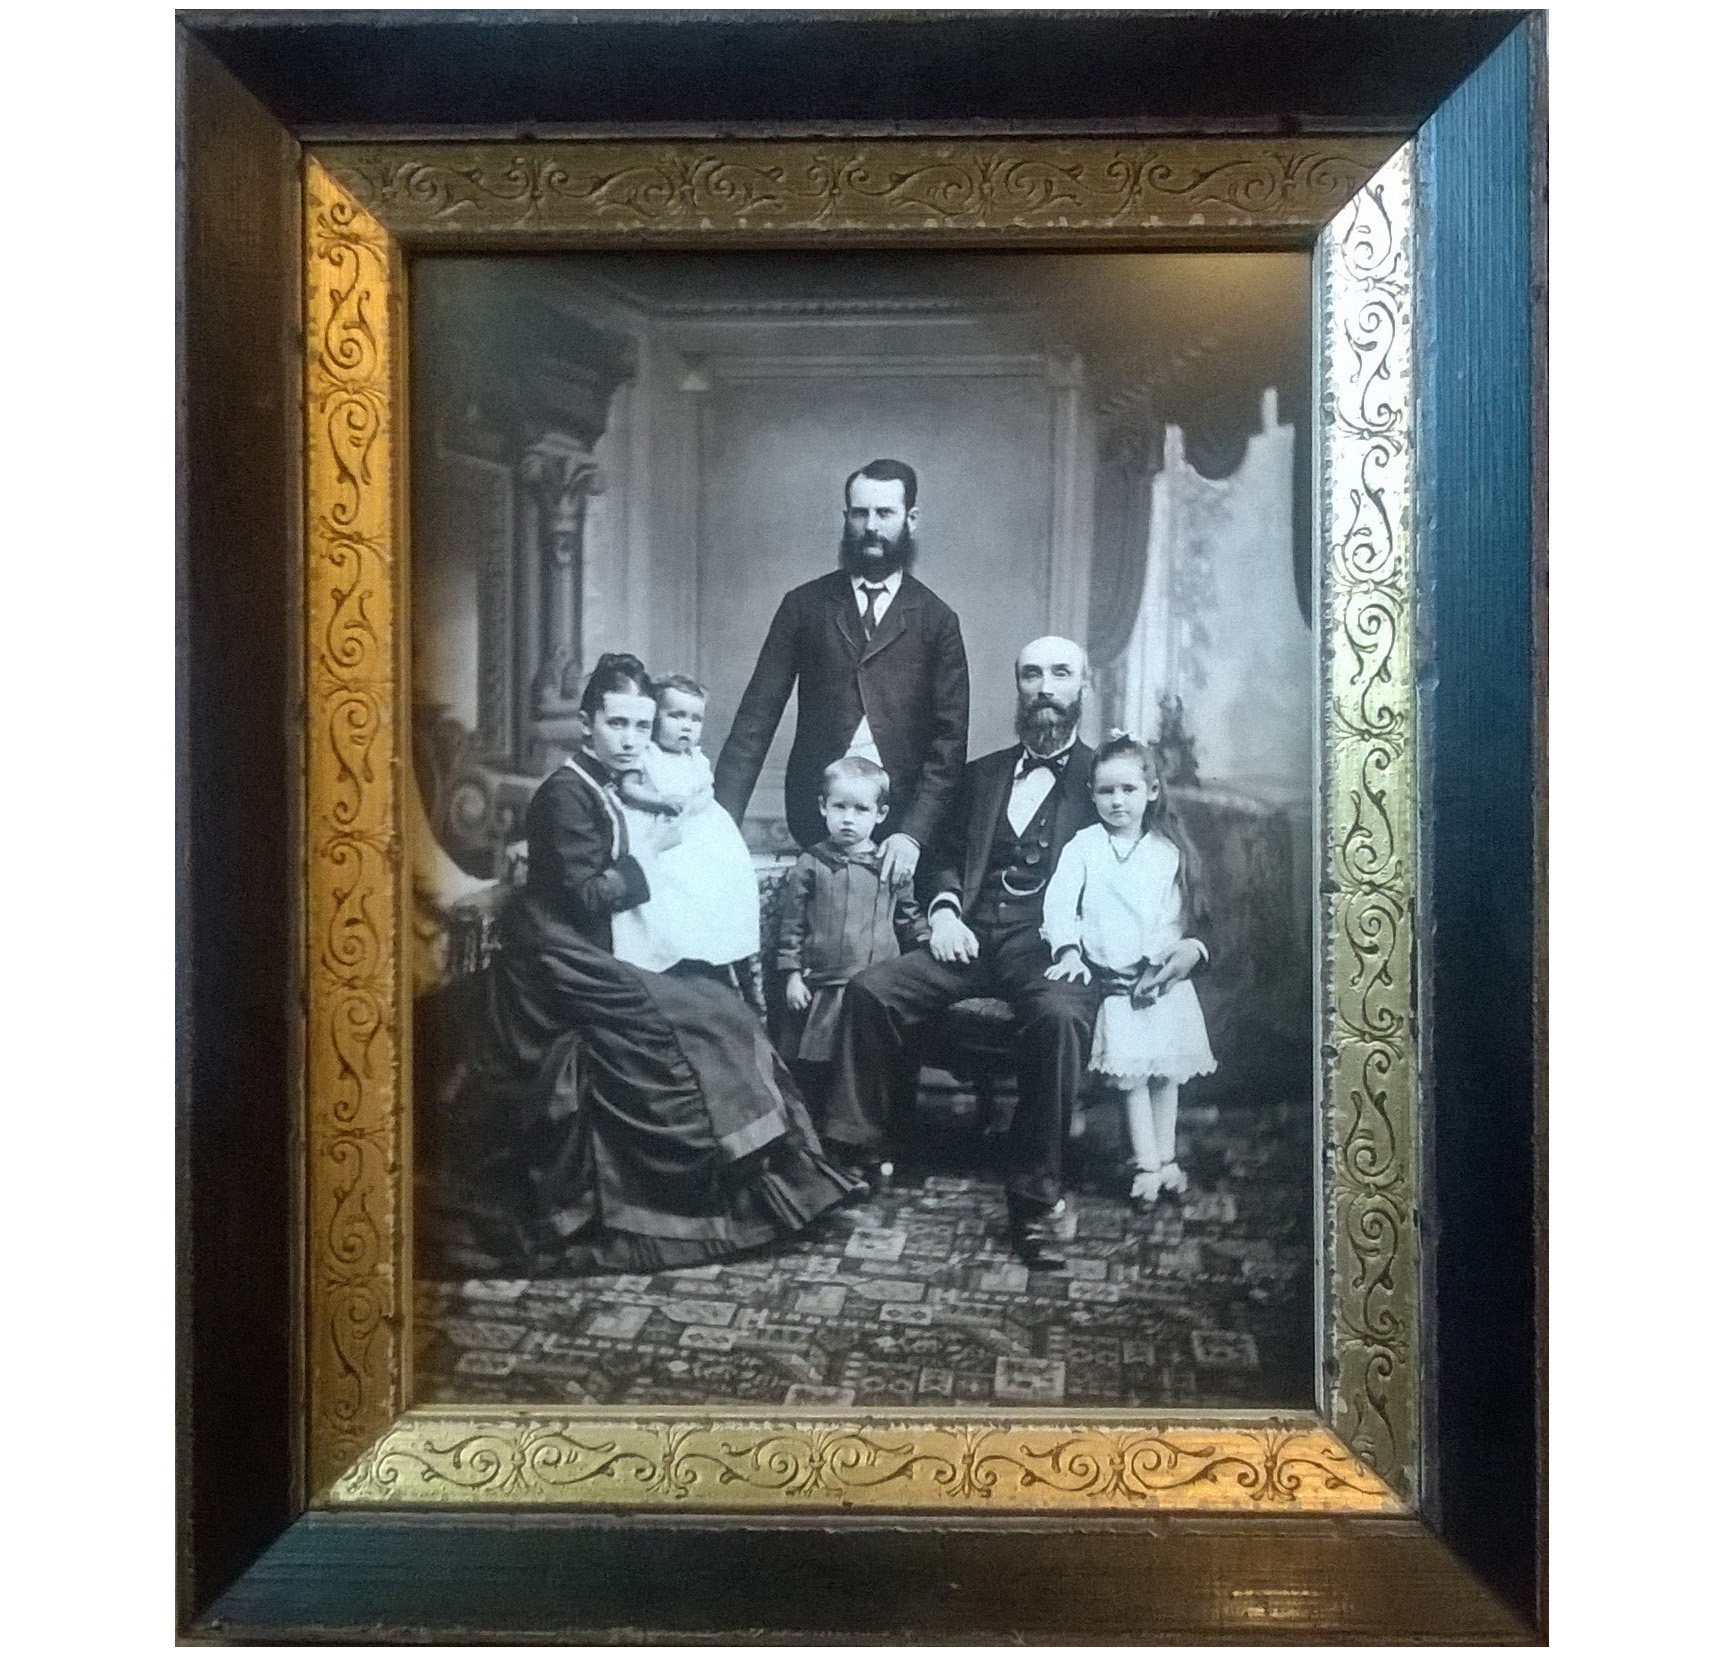 Framed antique family portrait